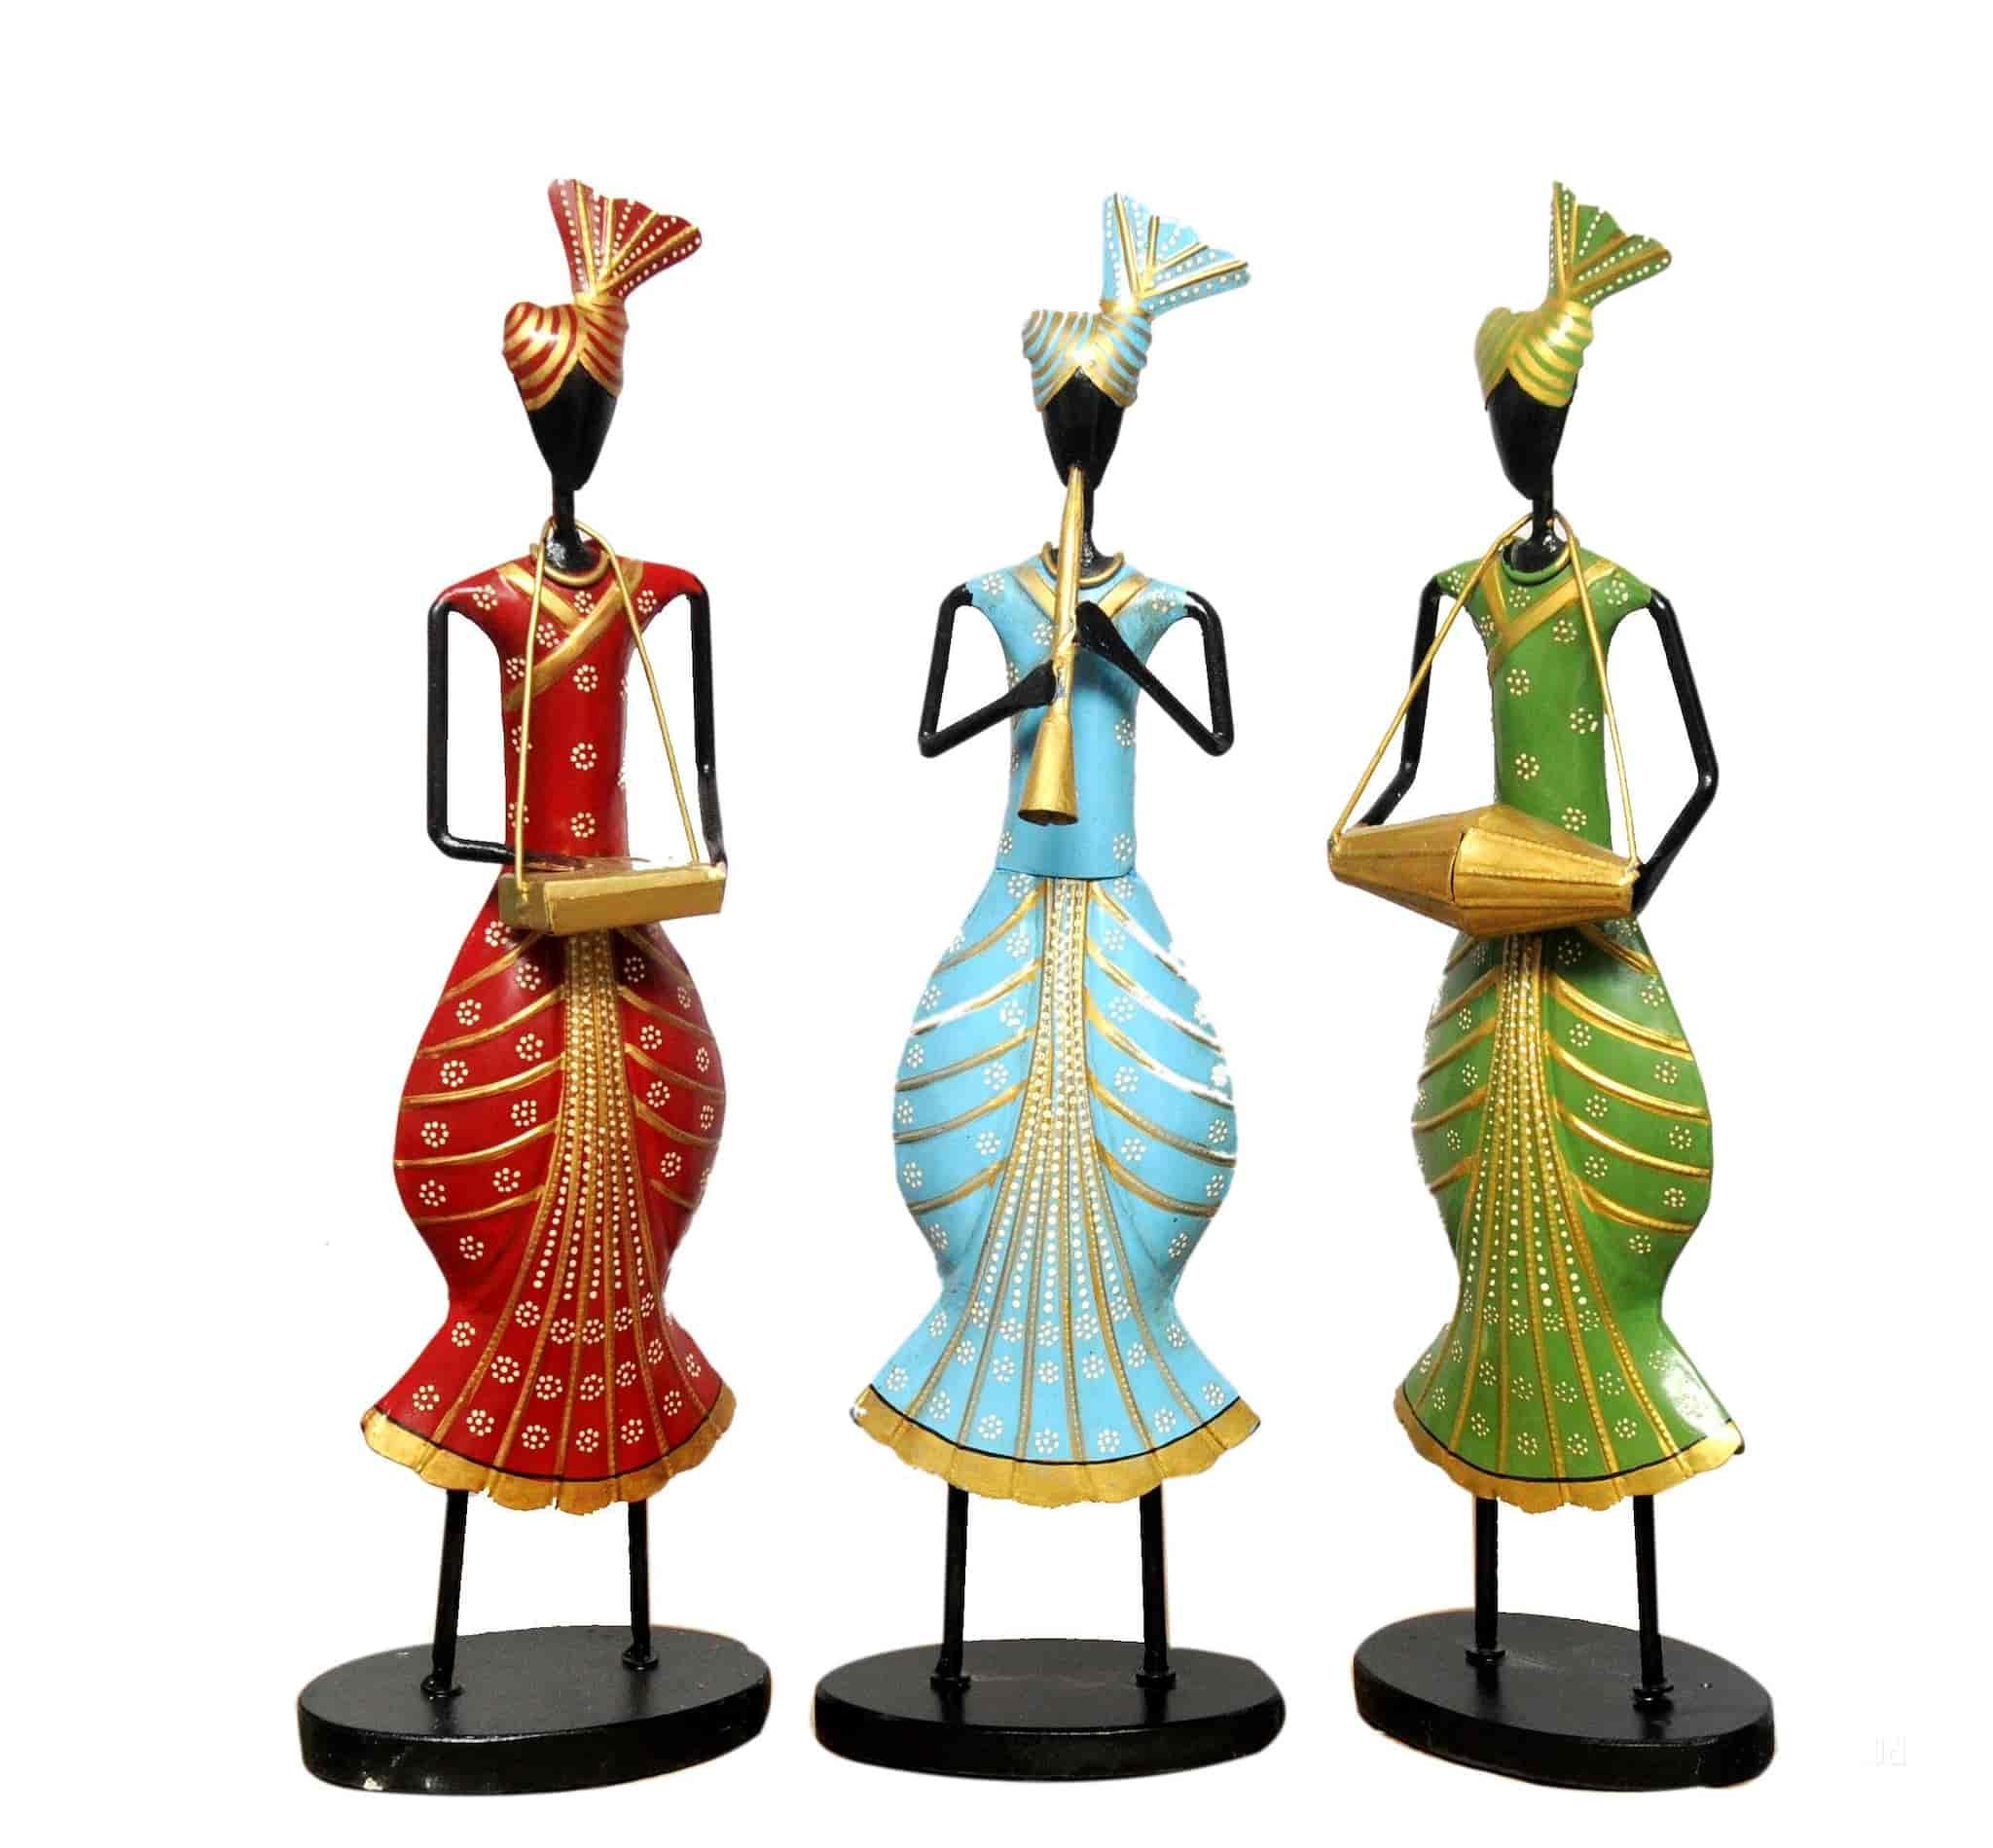 Indian Handicrafts Company Dwarka Sector 7 Handicraft Item